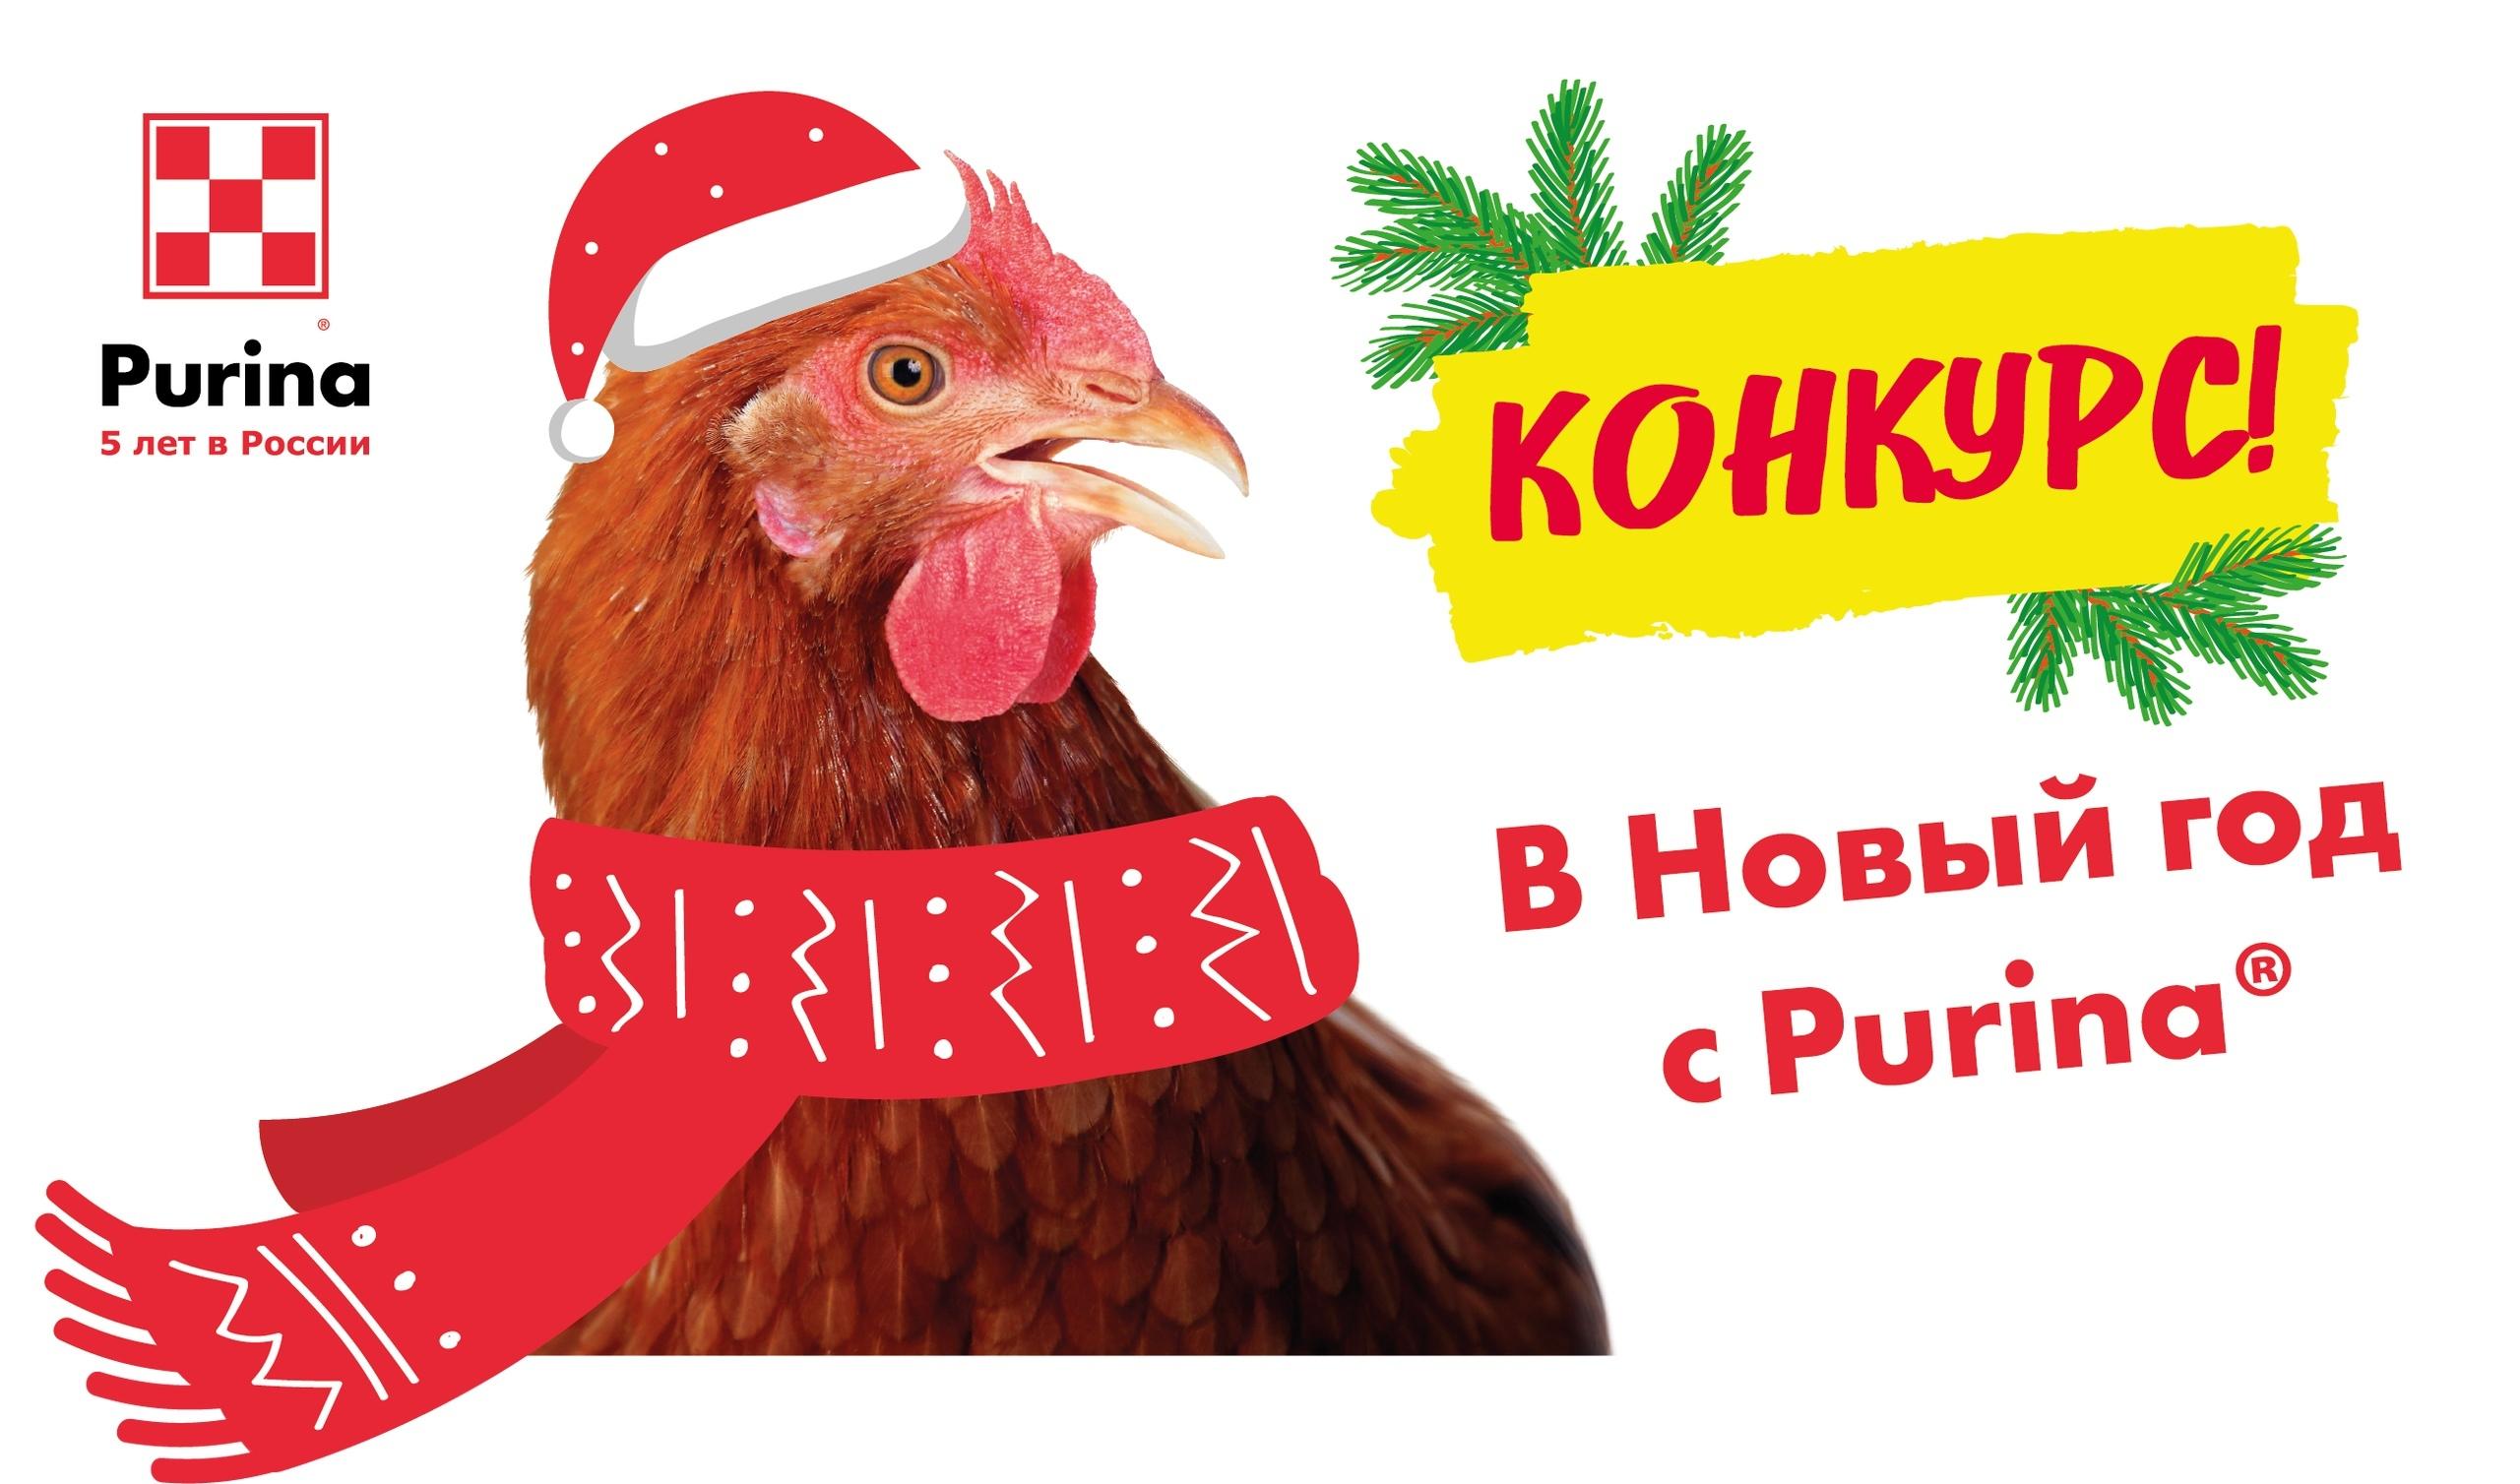 www.purina-agro.ru регистрация промо кода в 2020 году